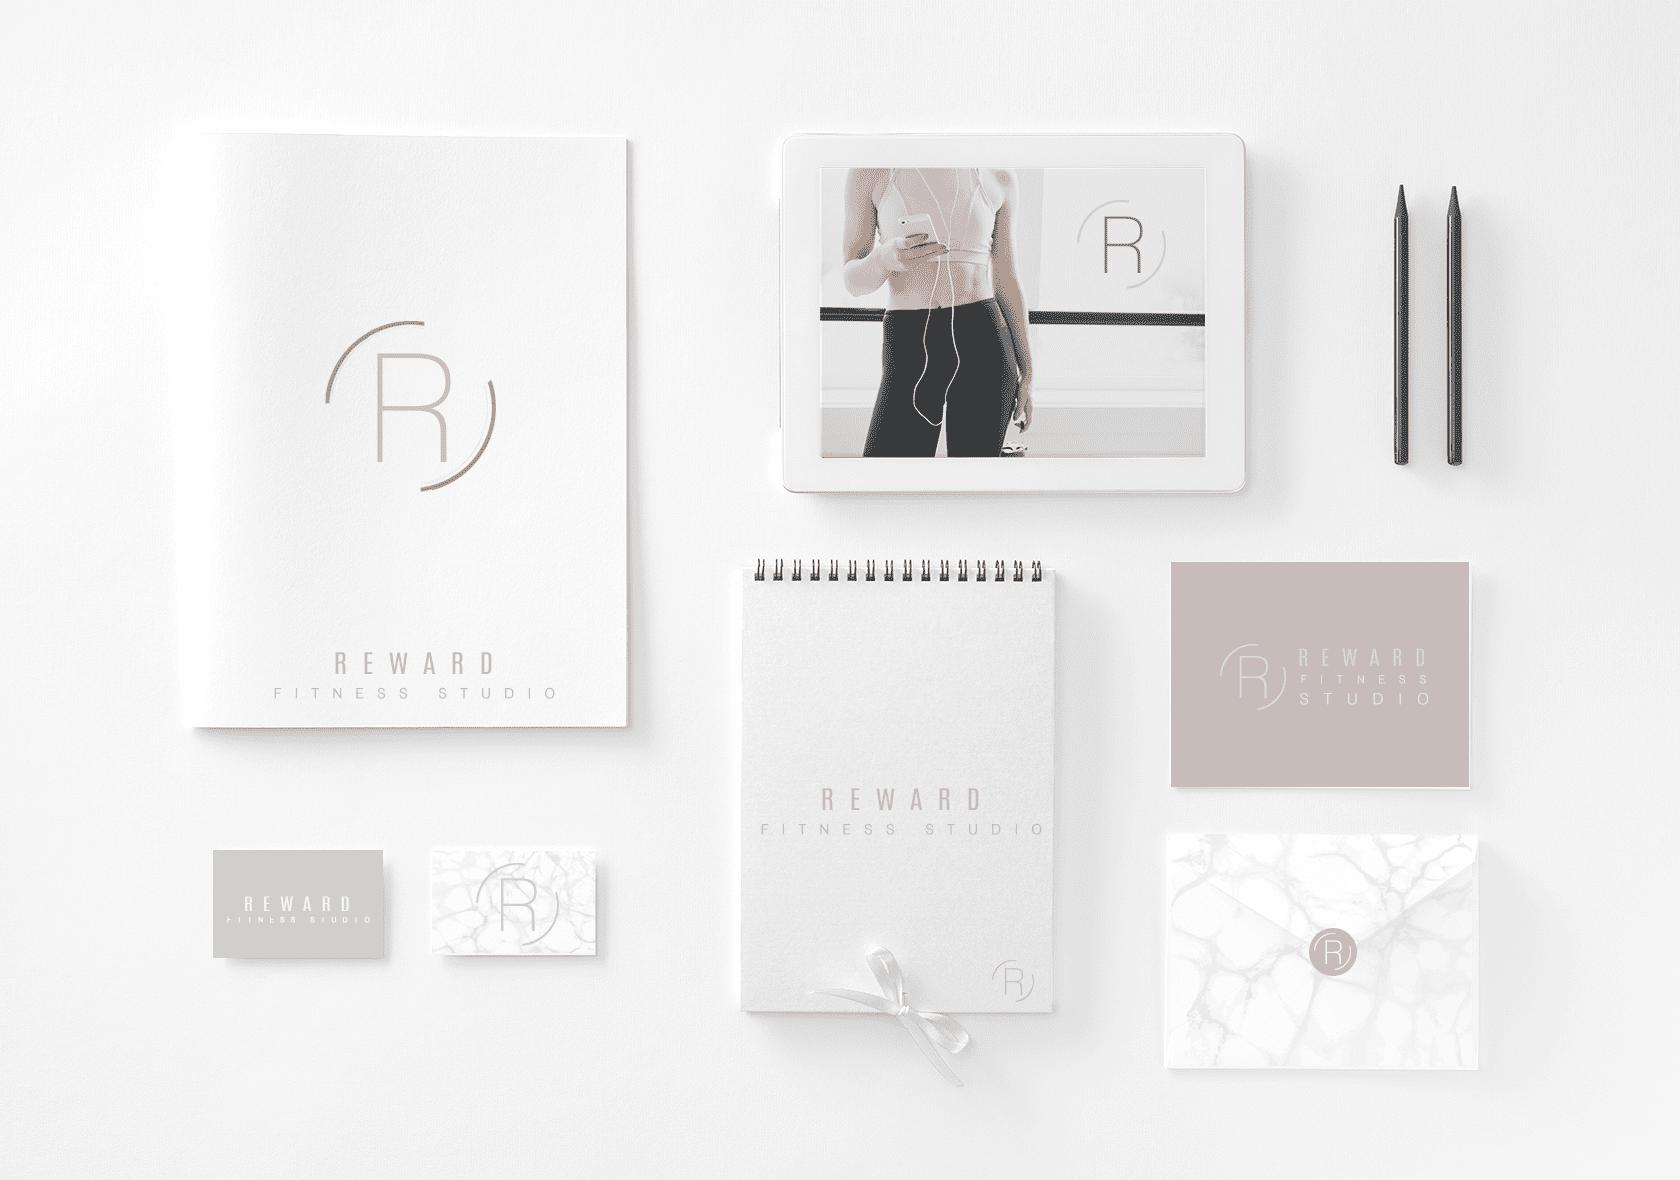 Reward-Fitness-Studio-Designed-by-Oliver-Spence-Creative-3